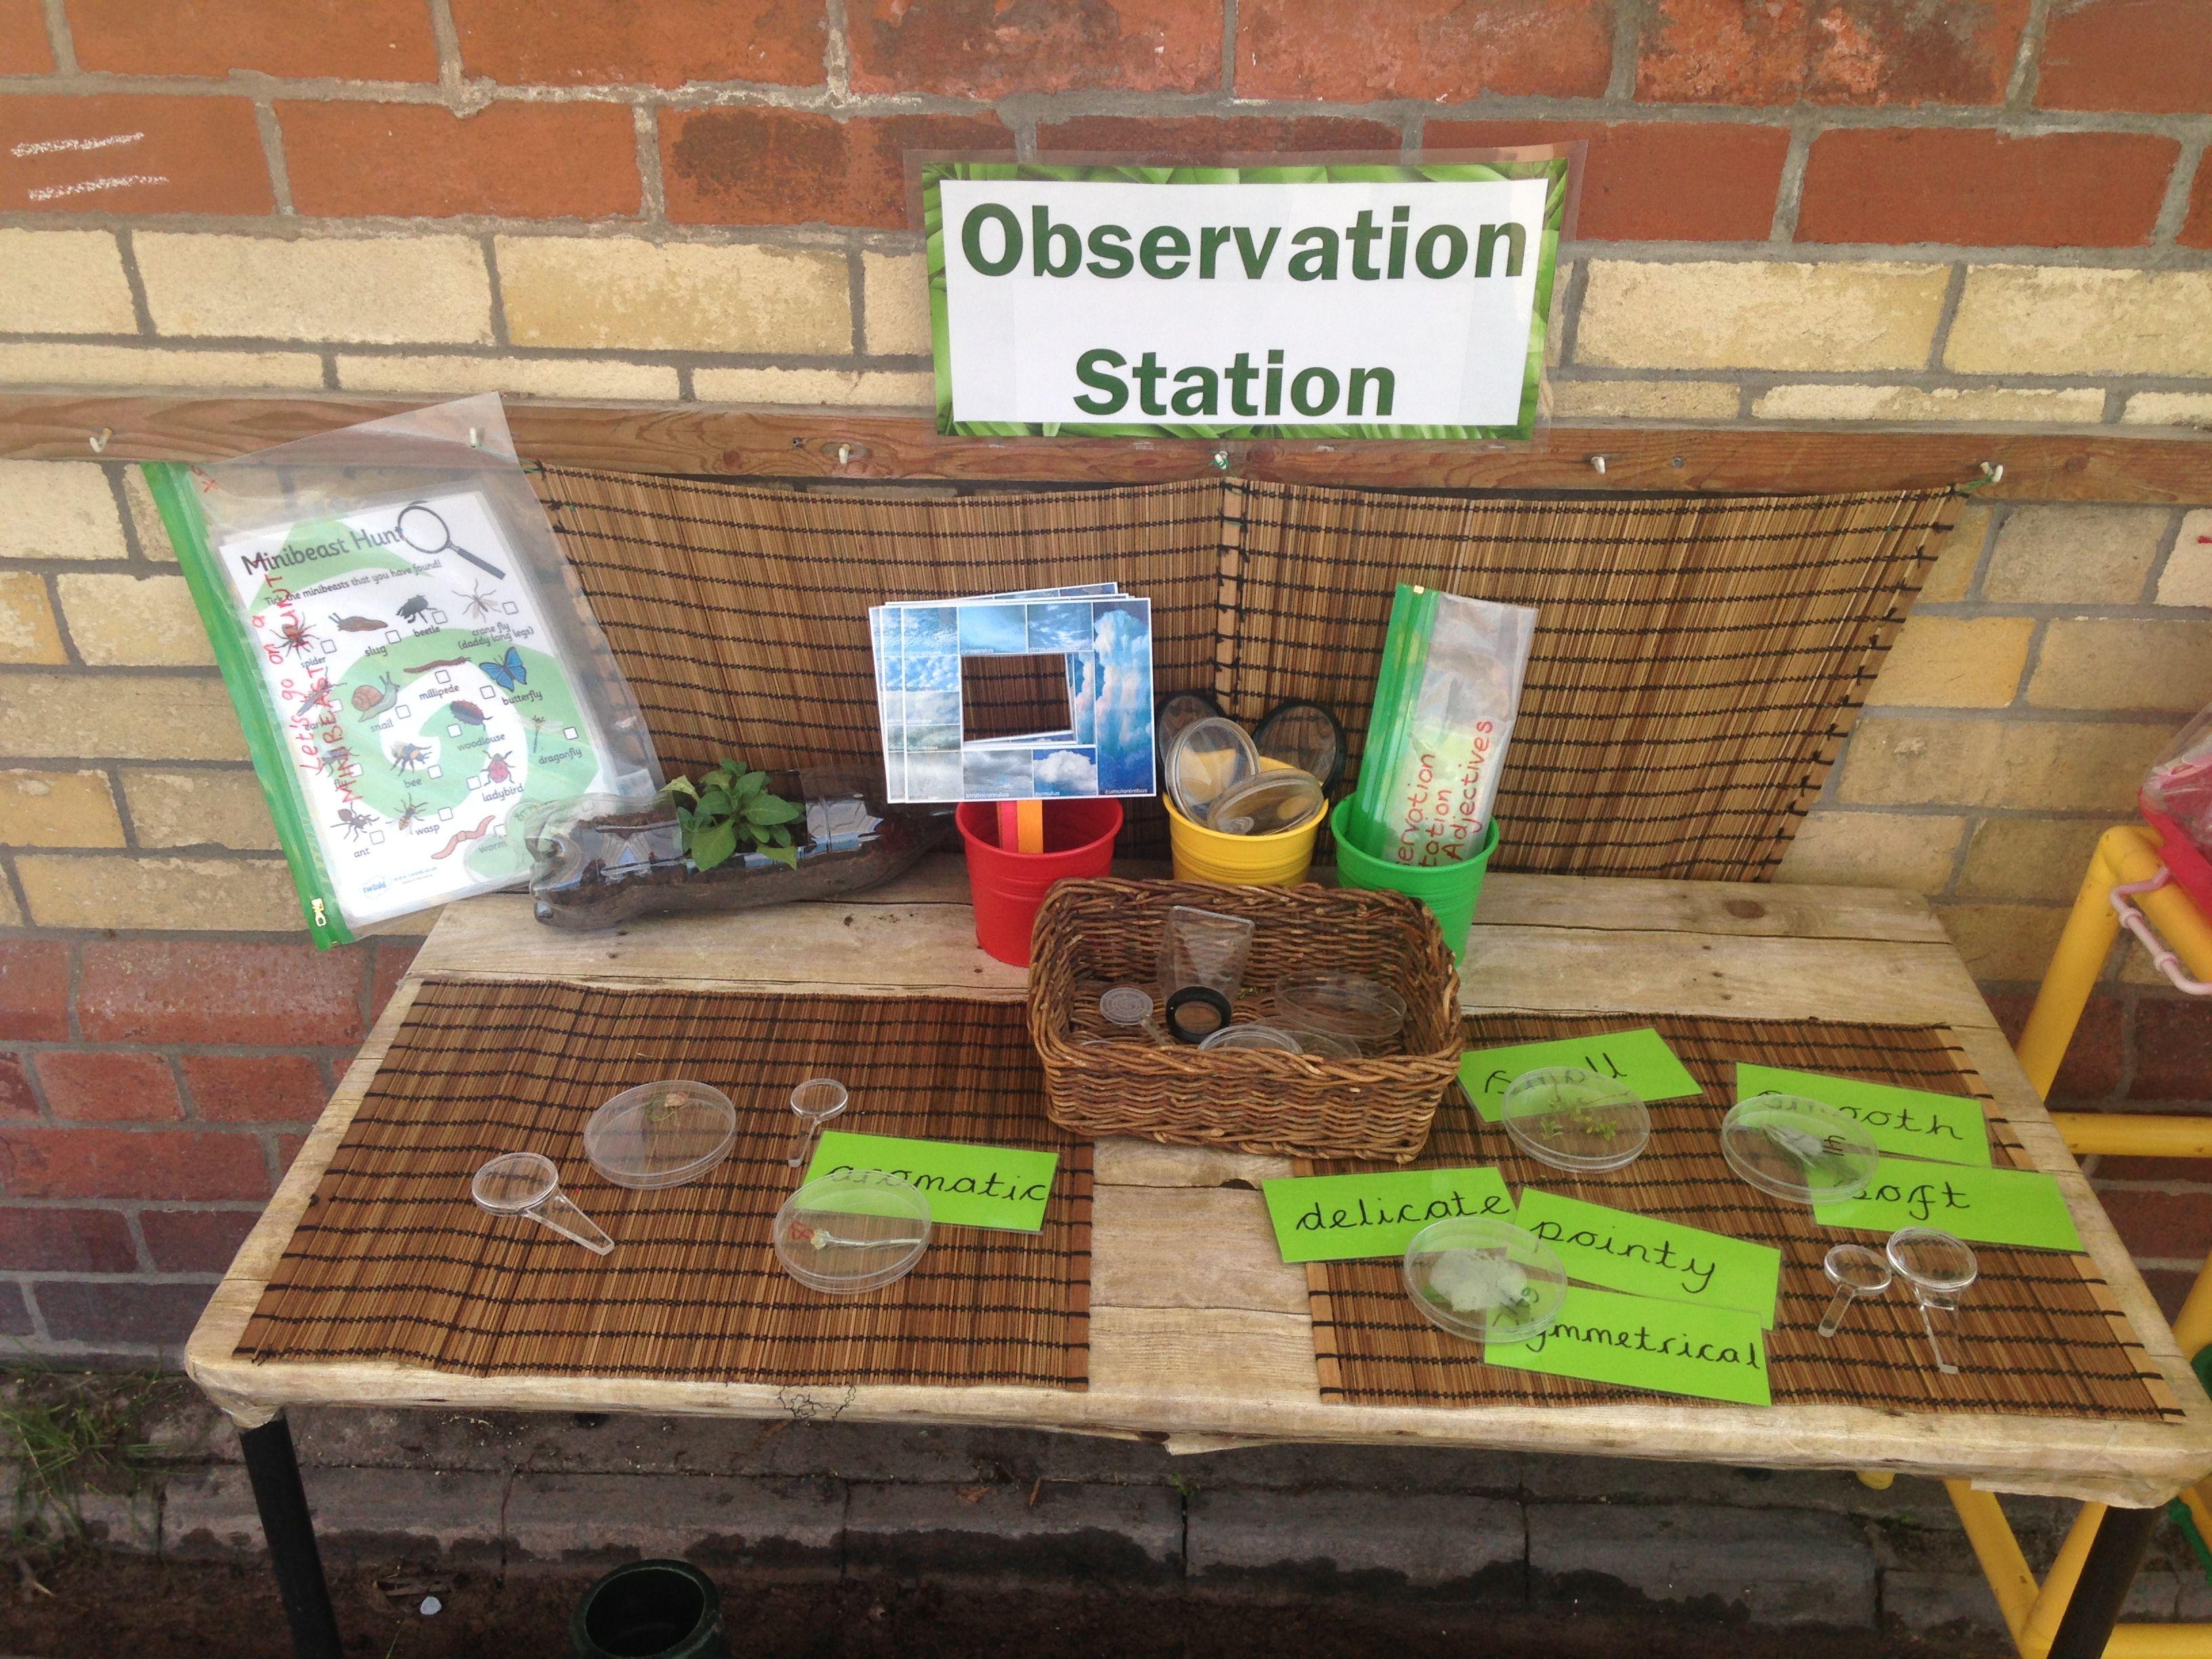 Observation Station Observe Mini Beasts Plants Herbs